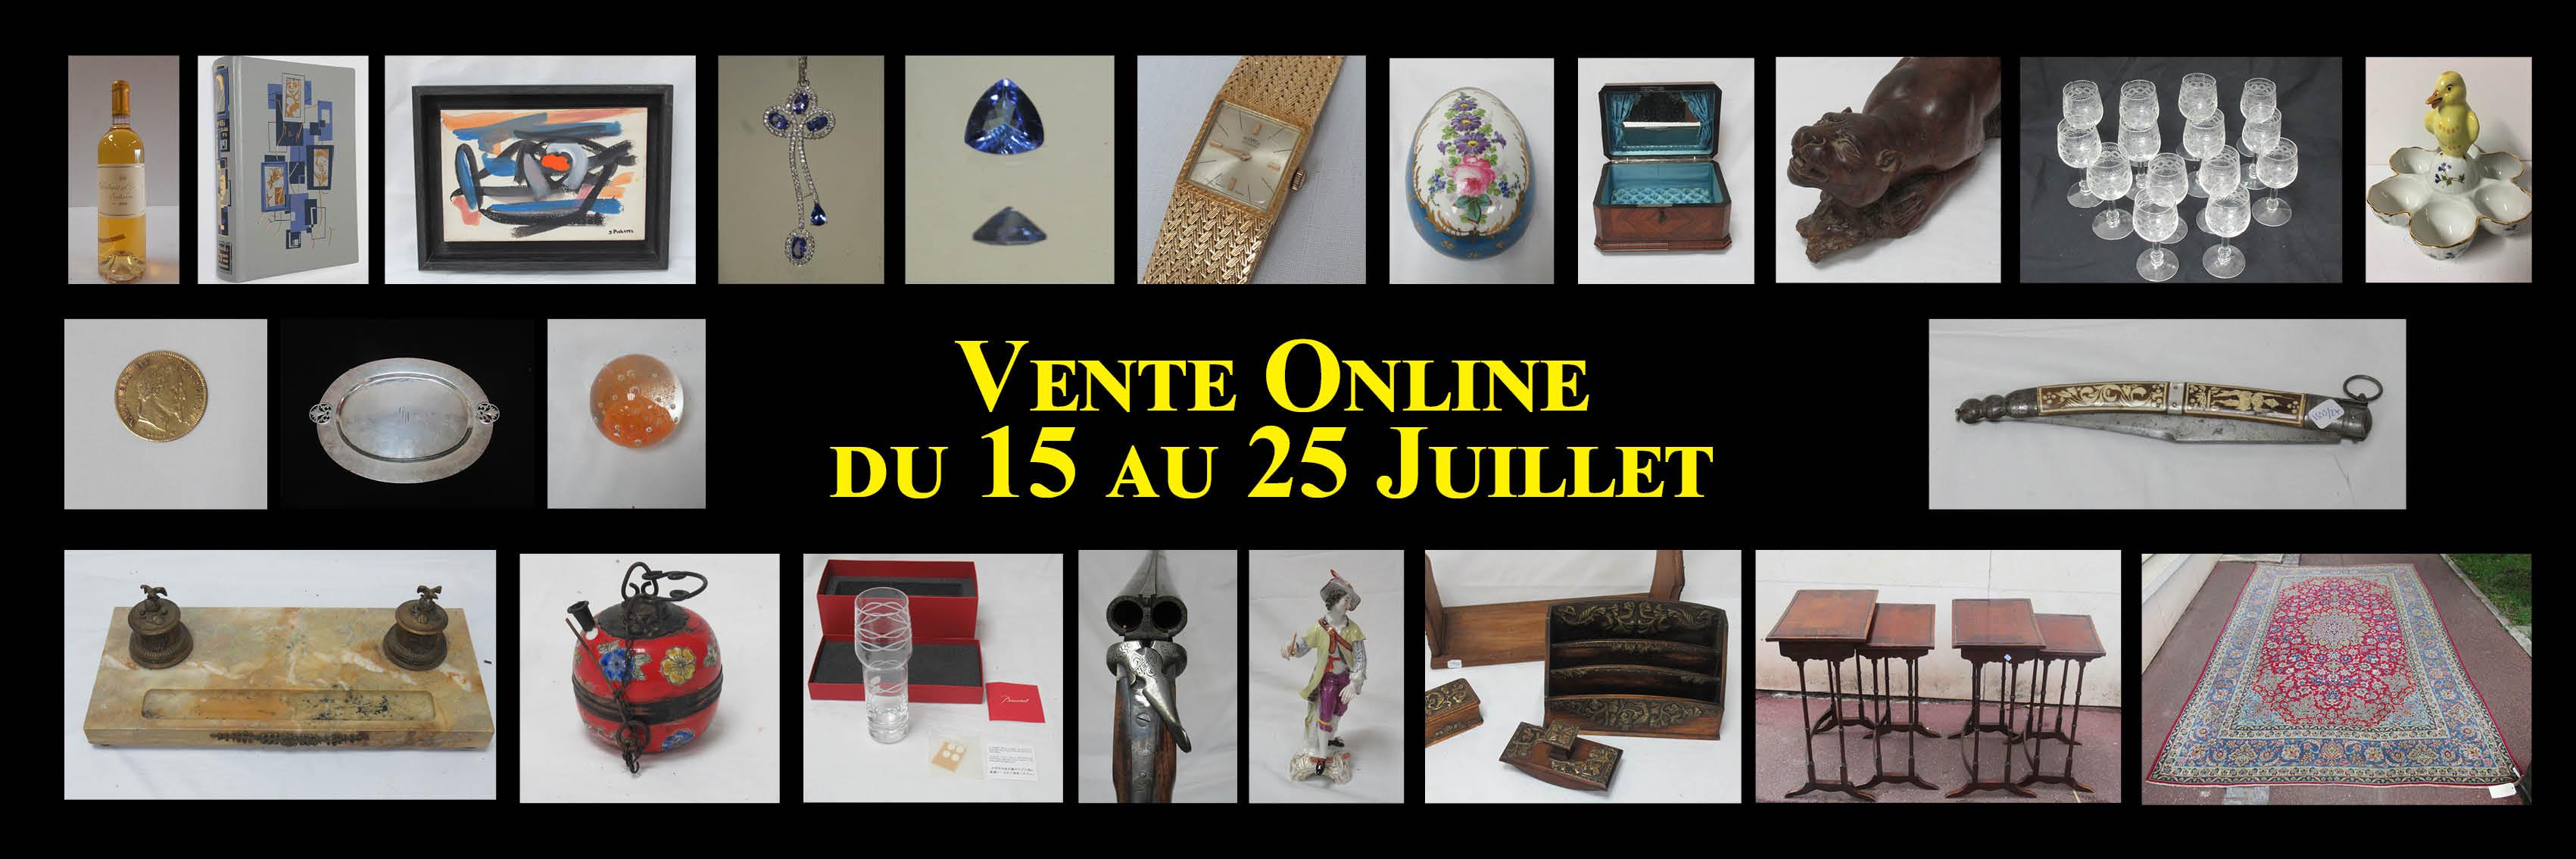 Vente online du 25 Juillet